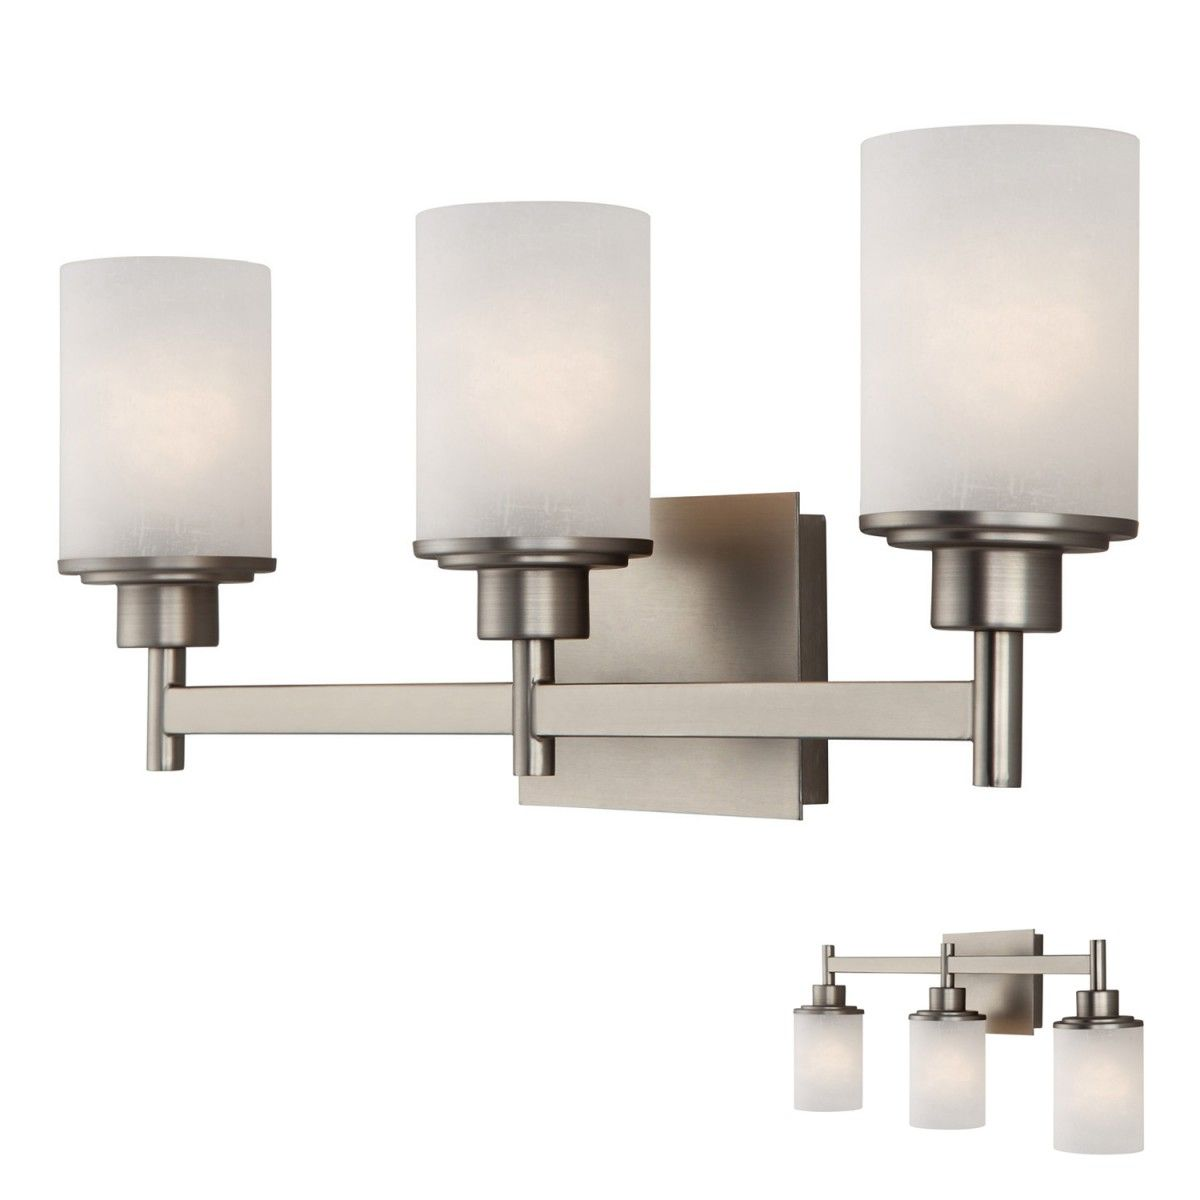 Canarm IVL408A03BN Lyndi 3 Globe Bath Vanity Light Bar Fixture